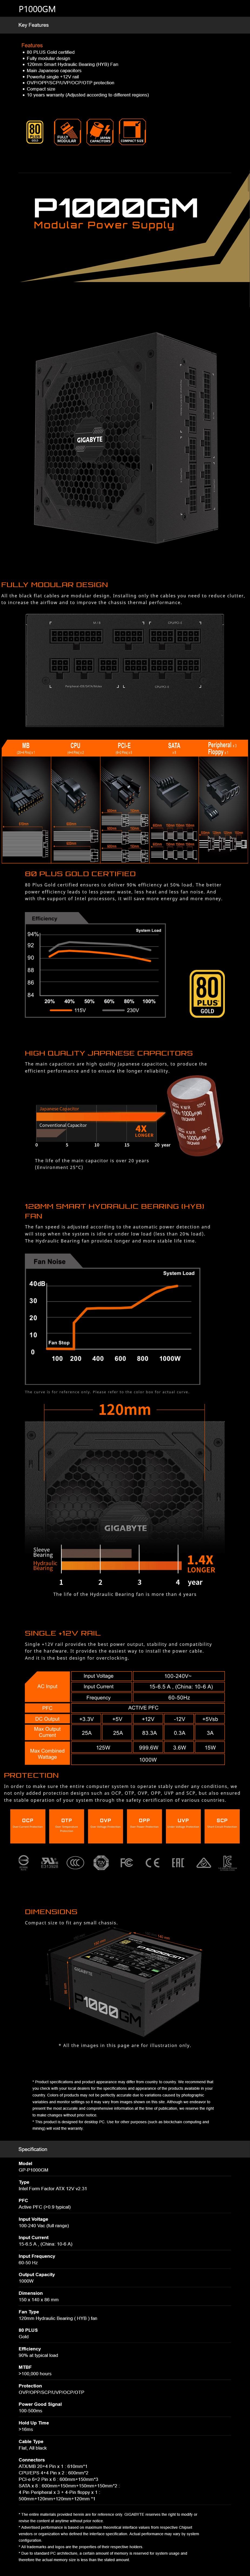 gigabyte-gpp1000gm-1000w-80-gold-fully-modular-power-supply-ac43216-7.jpg